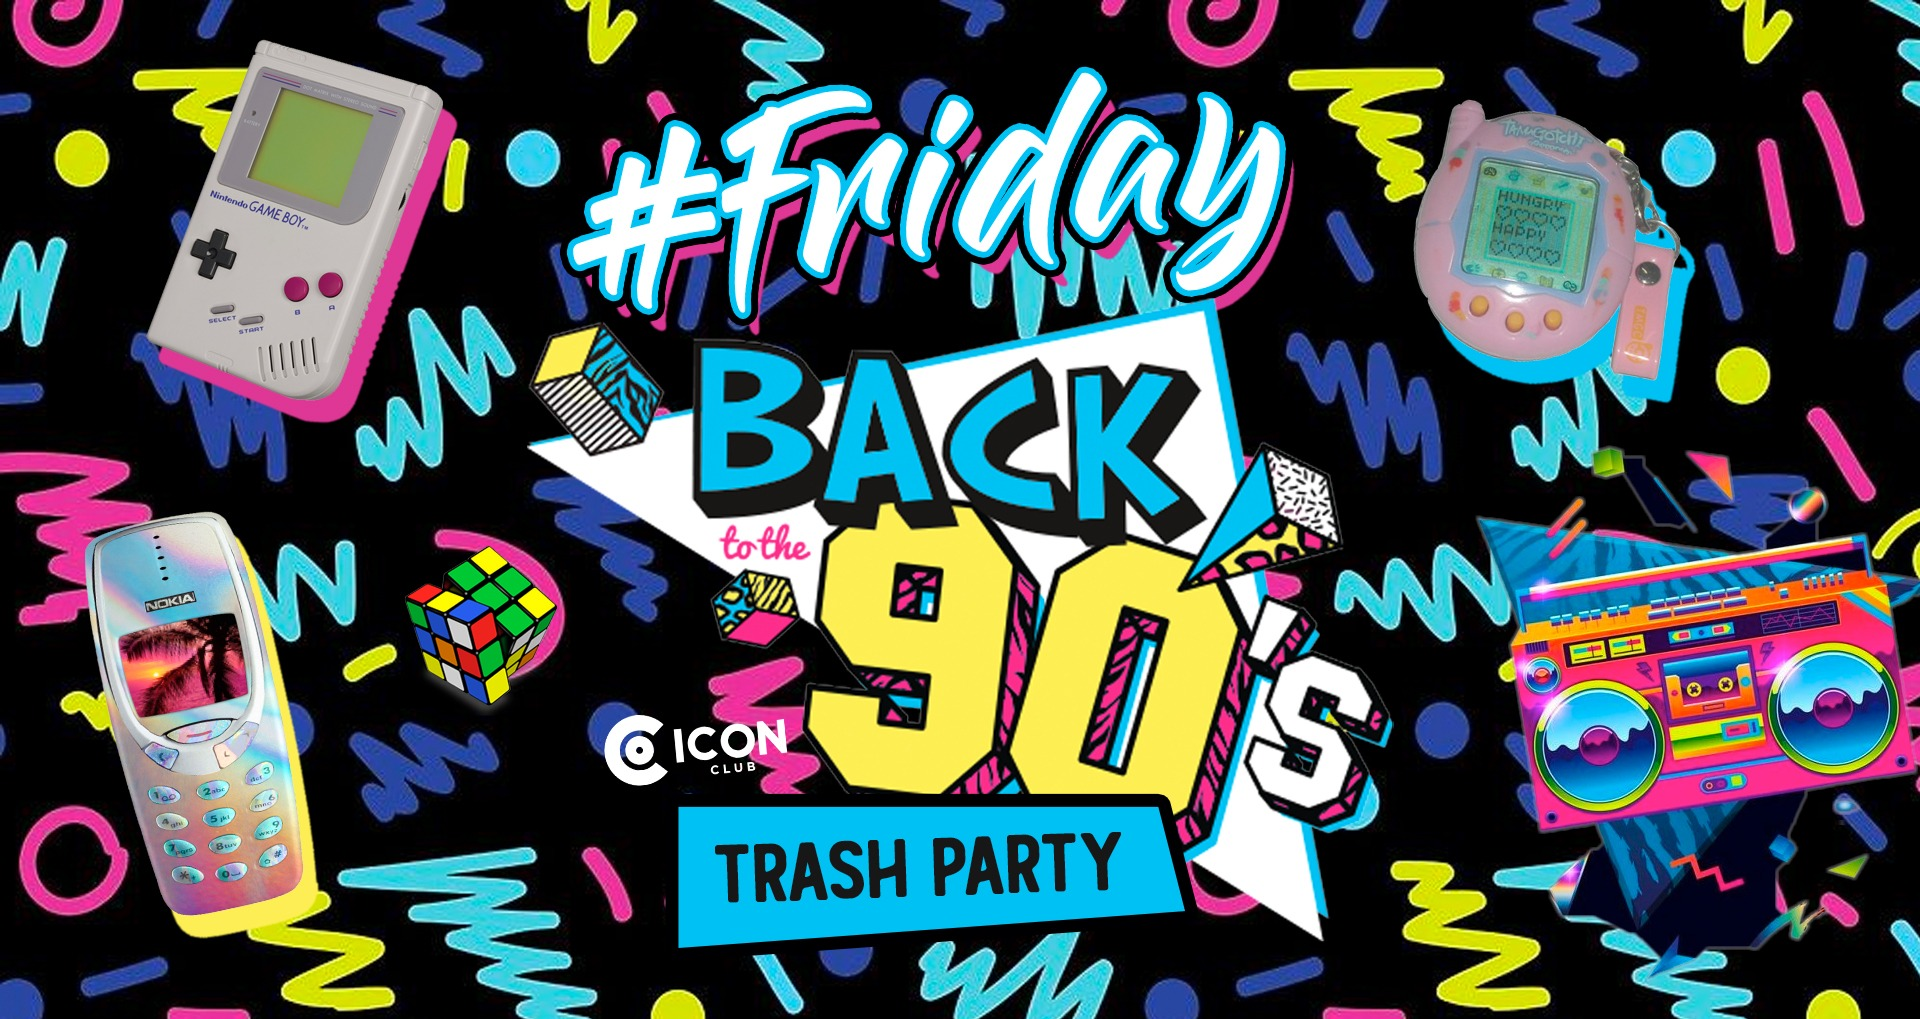 #Friday at Icon - Club Icon